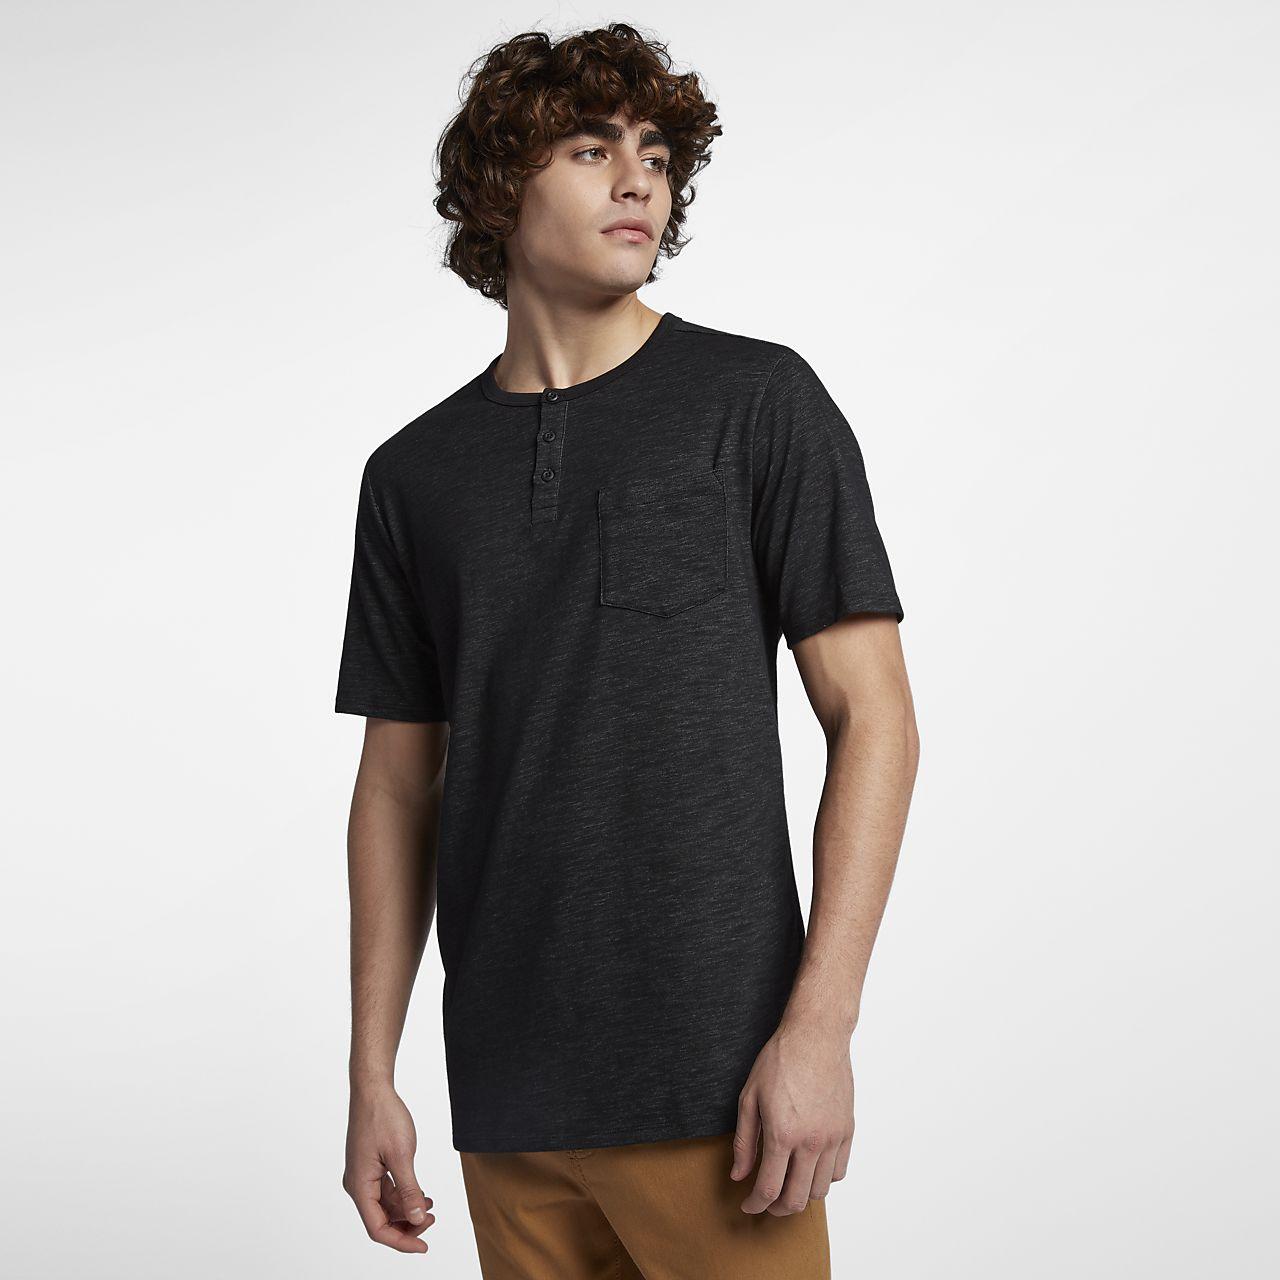 ... Hurley Dri-FIT Lagos Henley Men's Shirt